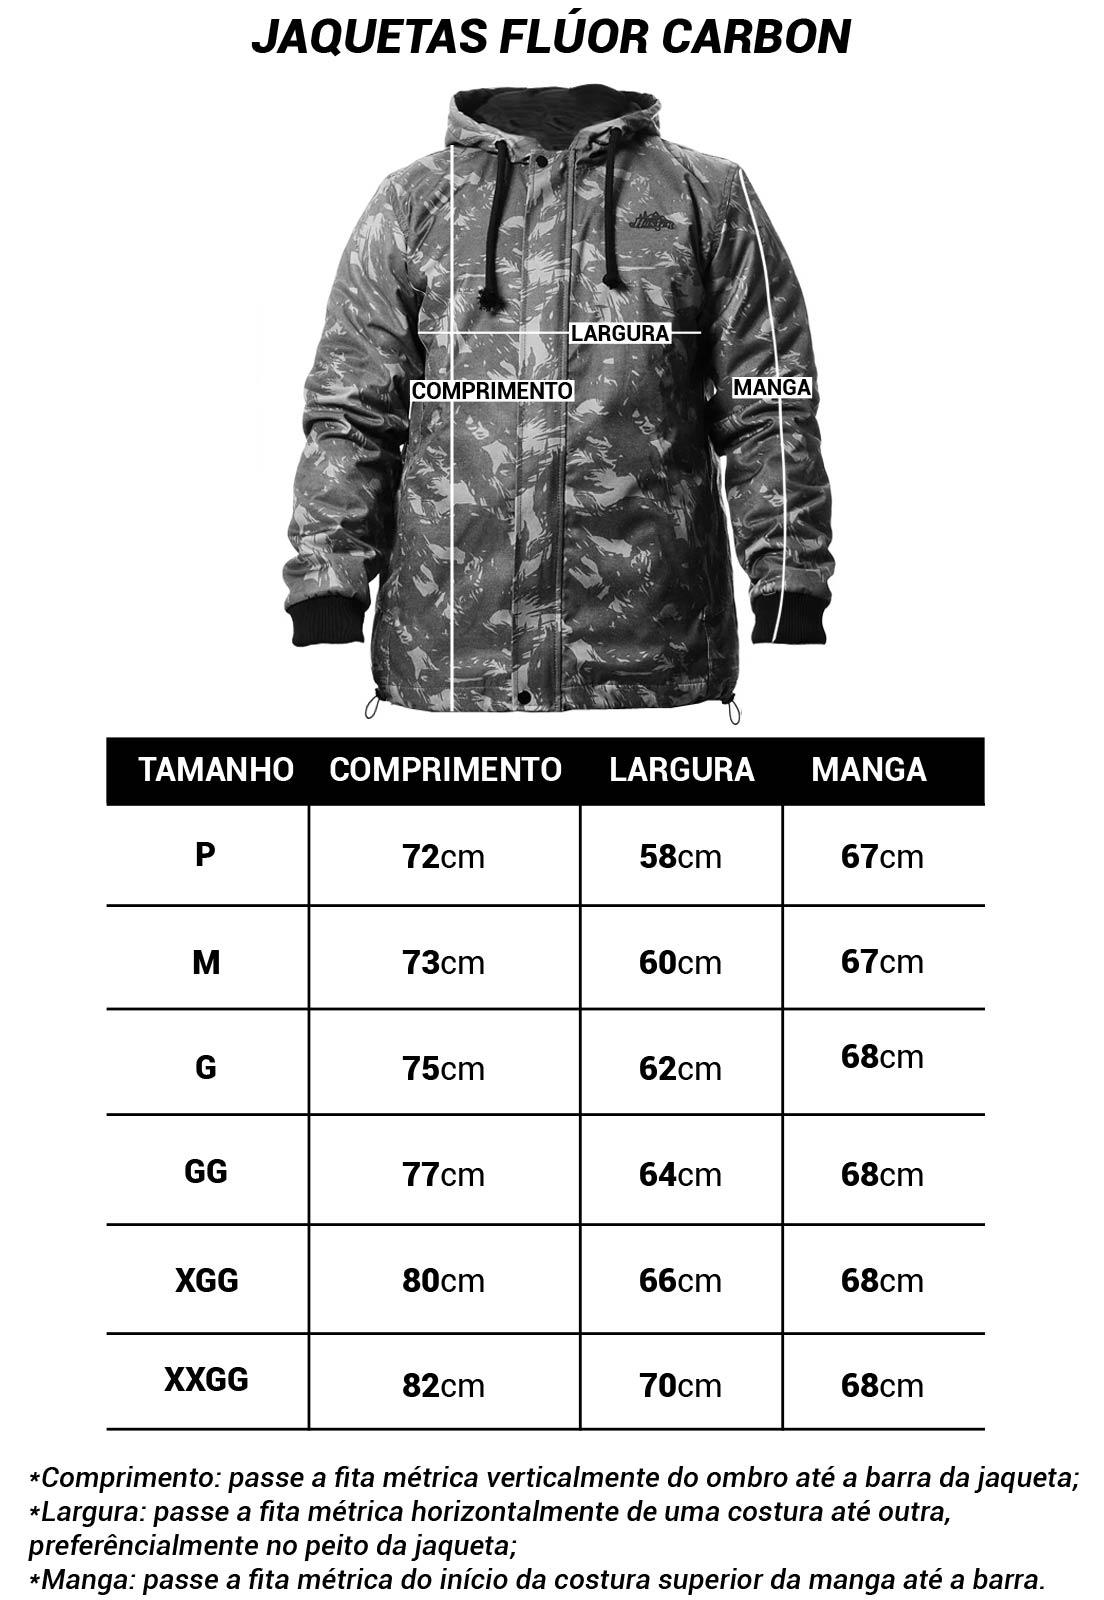 JAQUETA CAMUFLADA MULTICAM FLÚOR CARBON MASCULINA  - REAL HUNTER OUTDOORS